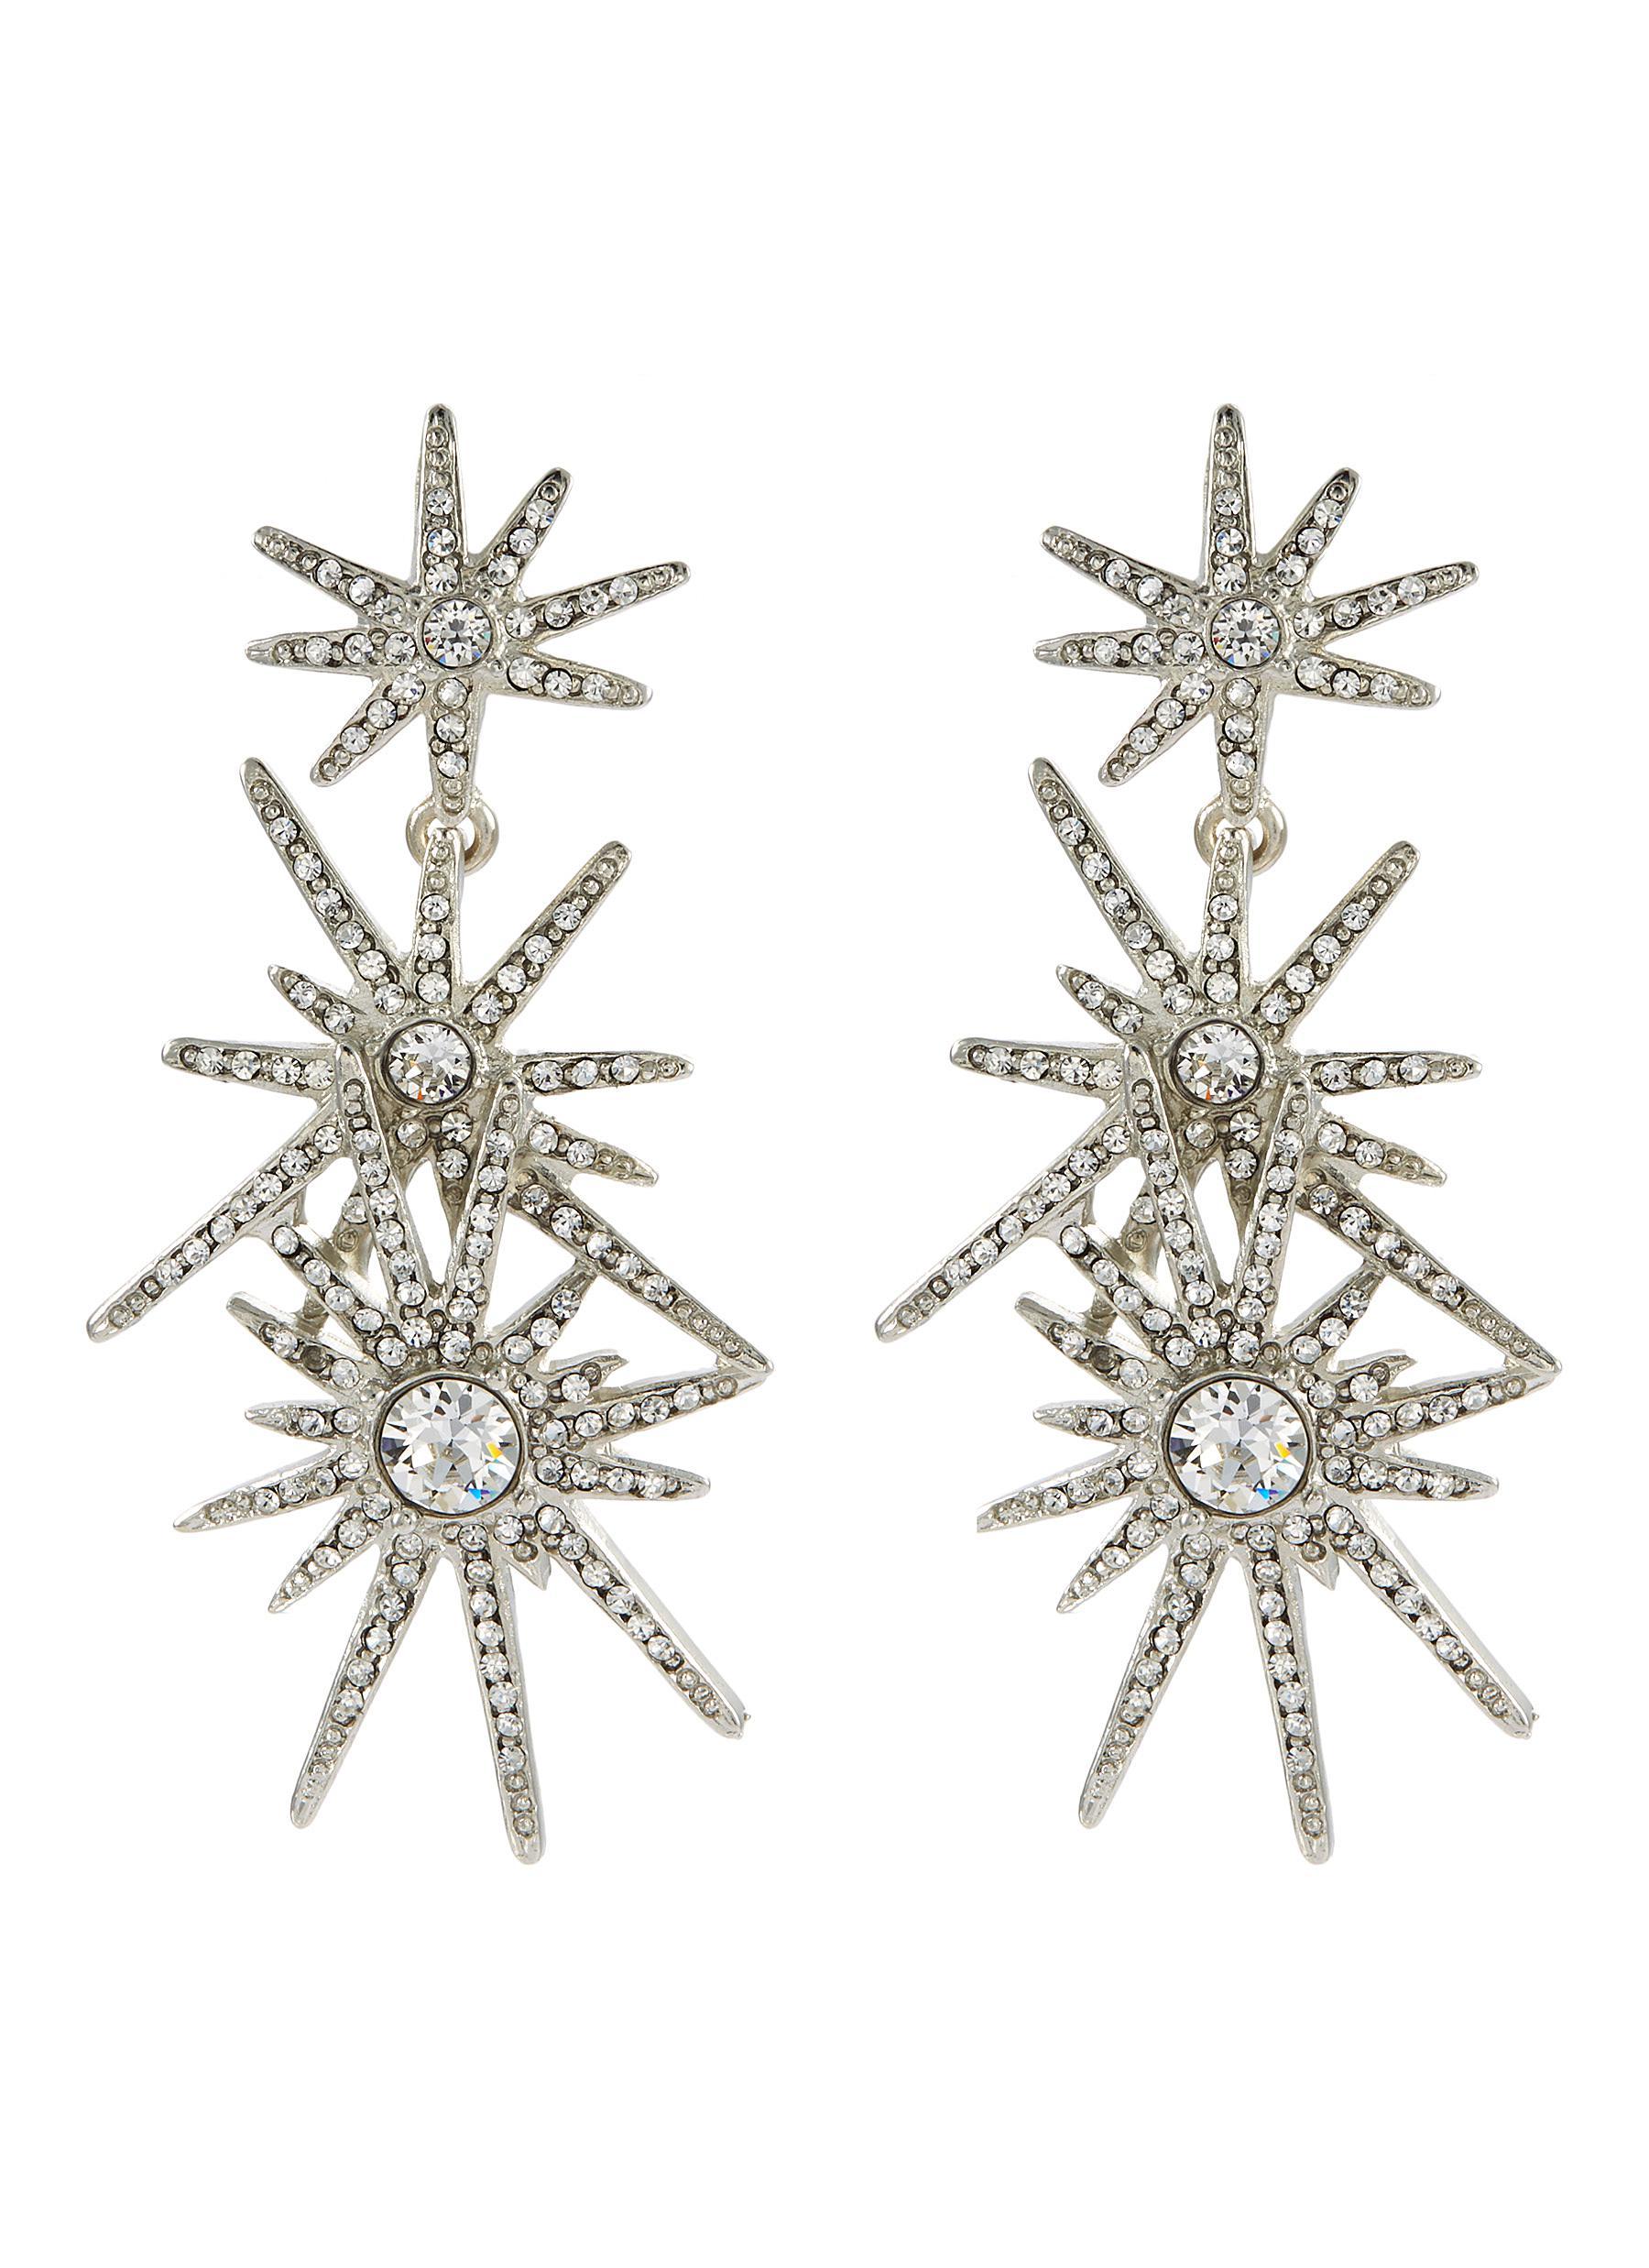 7fc919e2f KENNETH JAY LANE | Glass crystal starburst link drop clip earrings ...